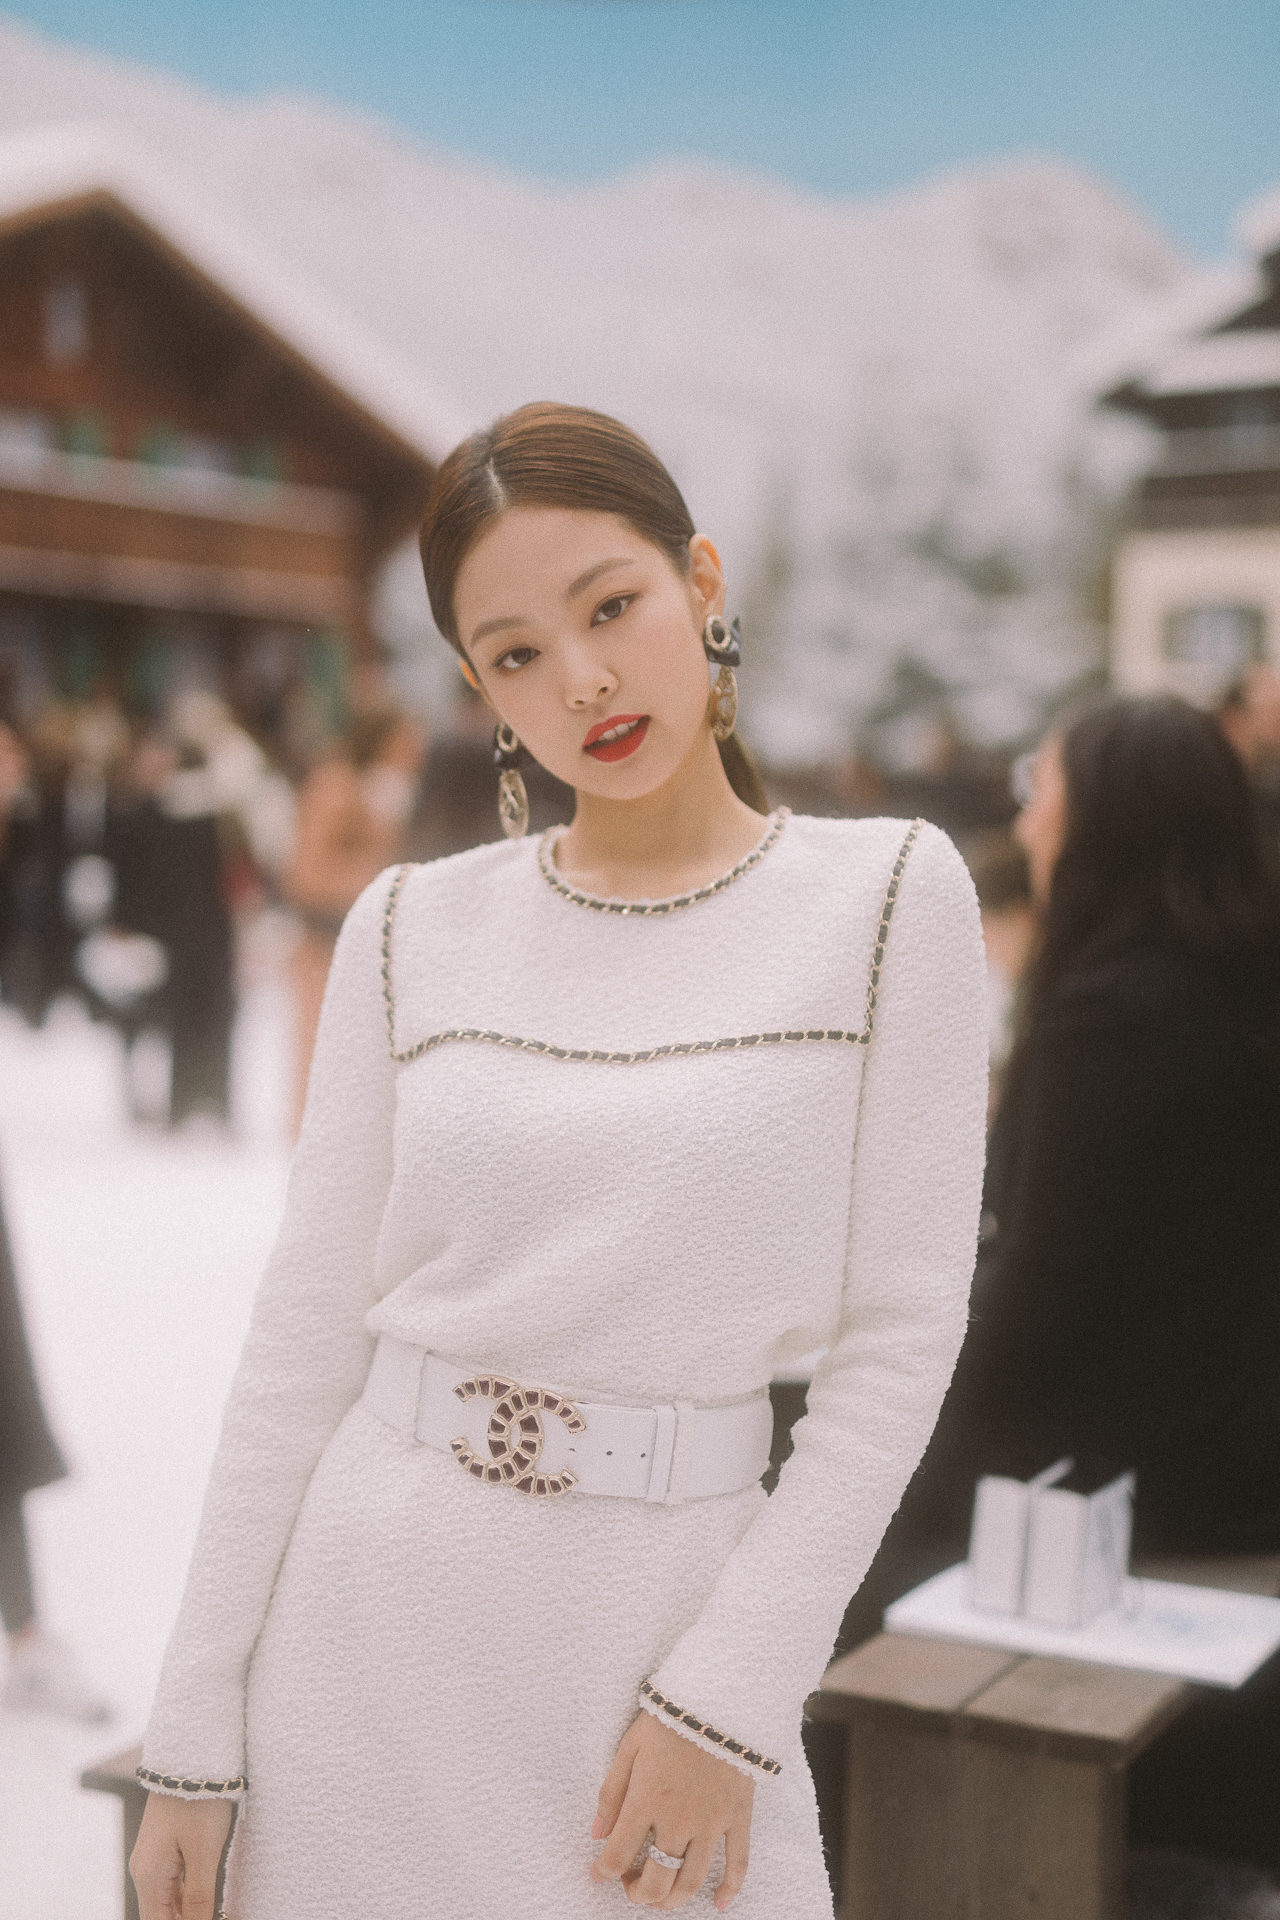 tuần lễ thời trang RTW jennie kim